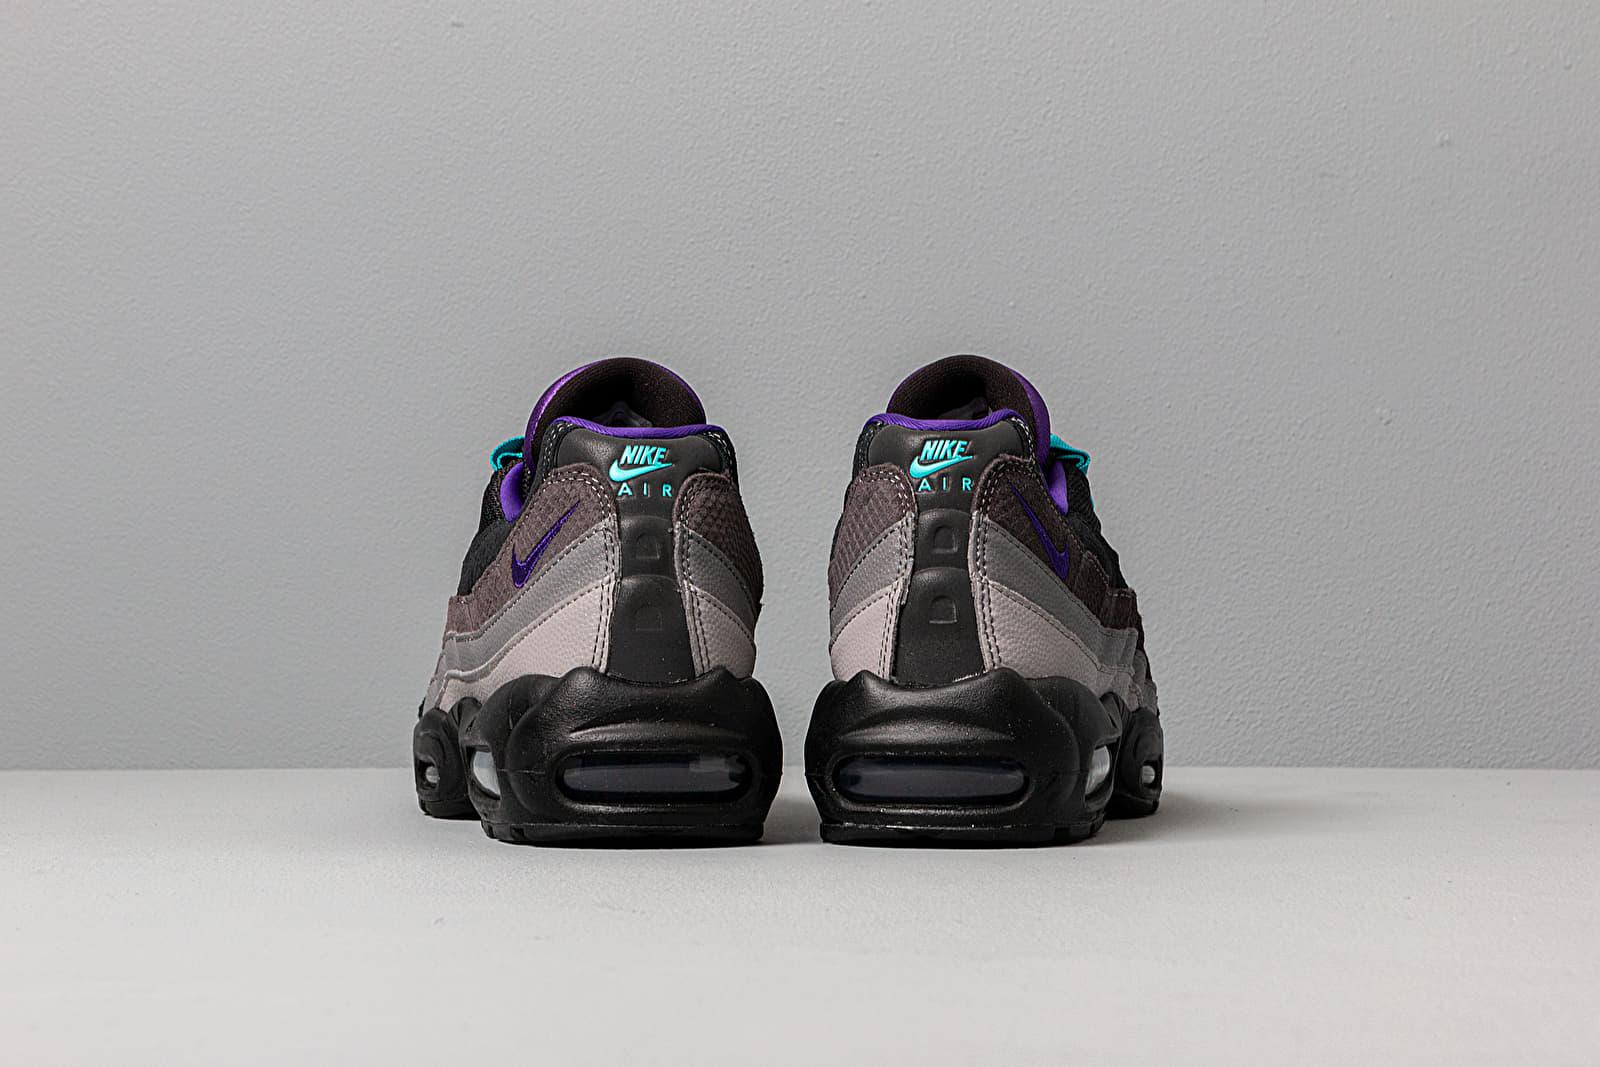 Nike Air Max 95 LV8 BlackCourt PurpleTeal Nebula